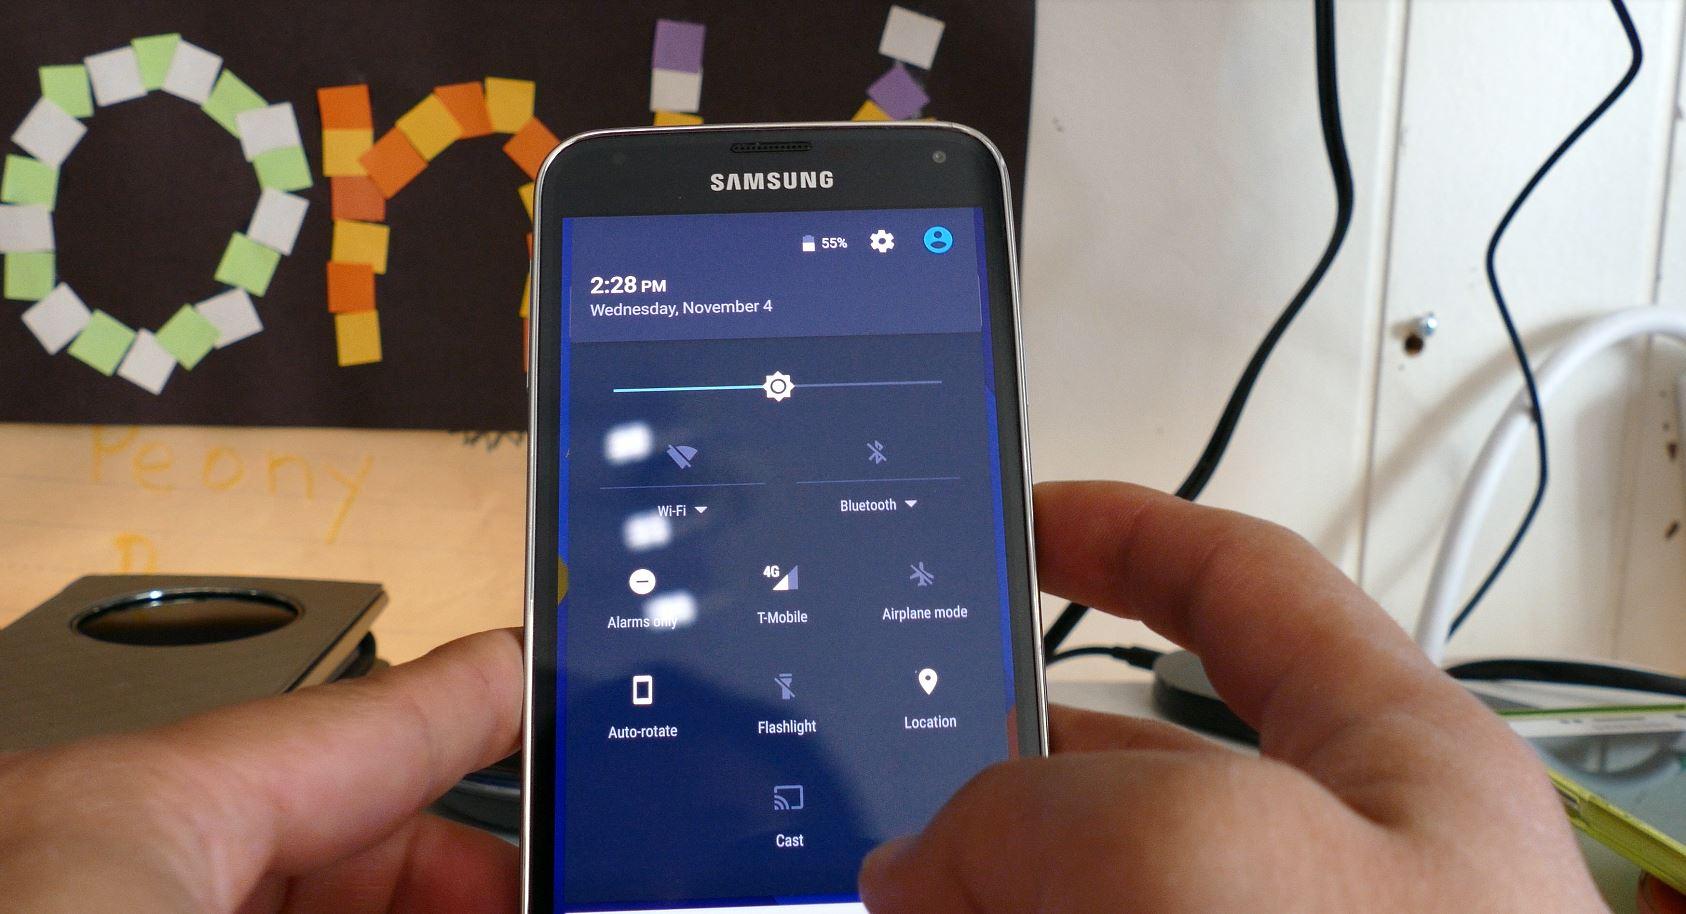 android6.0-marshmallow-root-galaxys5-vrtoxinrom